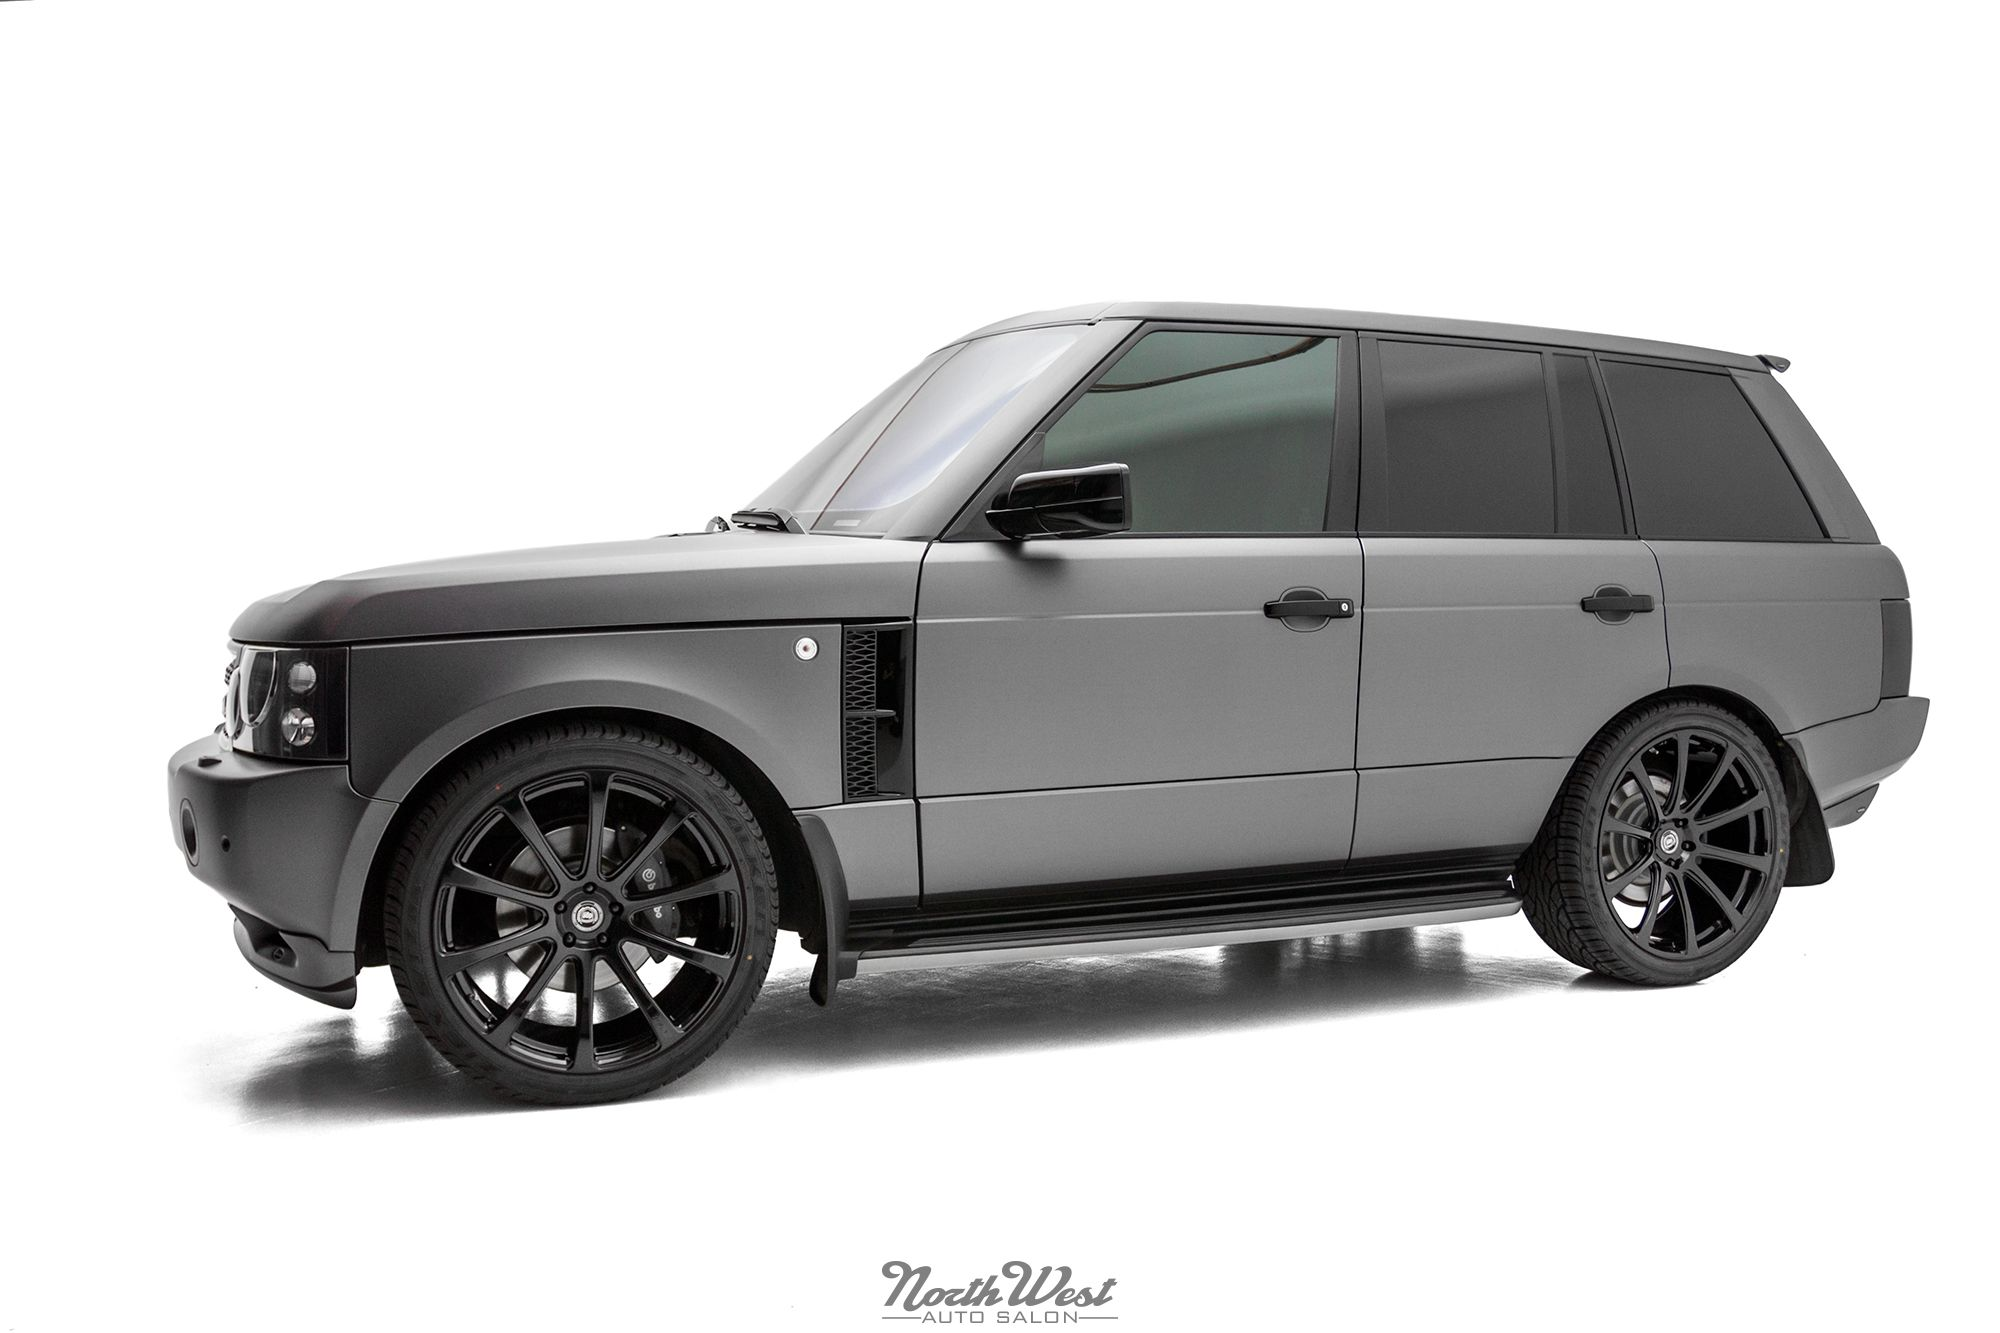 Overfinch range rover hse vehicle wrap on dpe wheels at nwas northwest auto salon